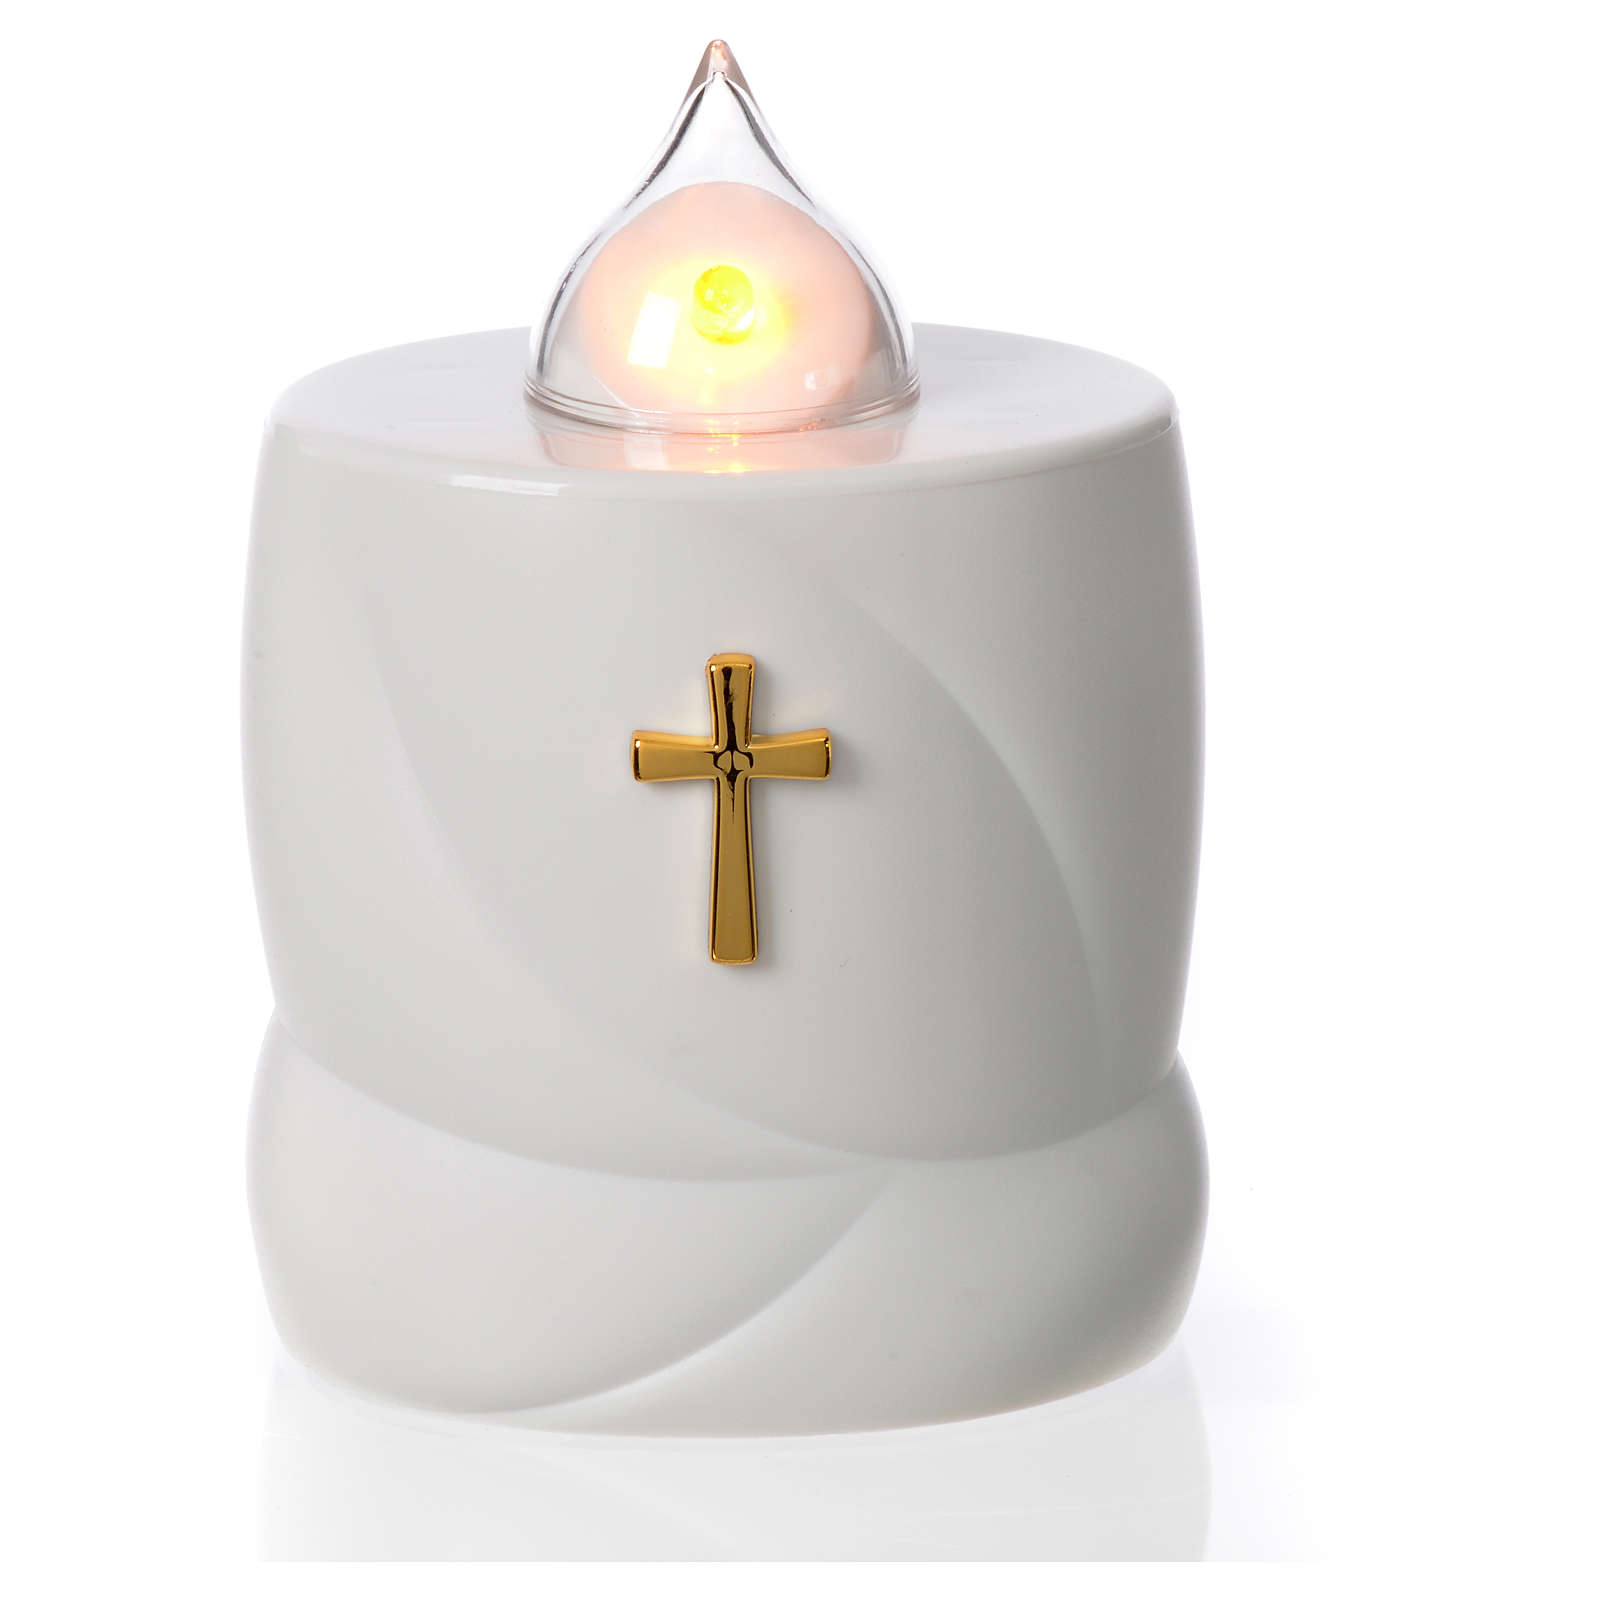 Veilleuse Lumada blanc croix flamme jaune réelle 3